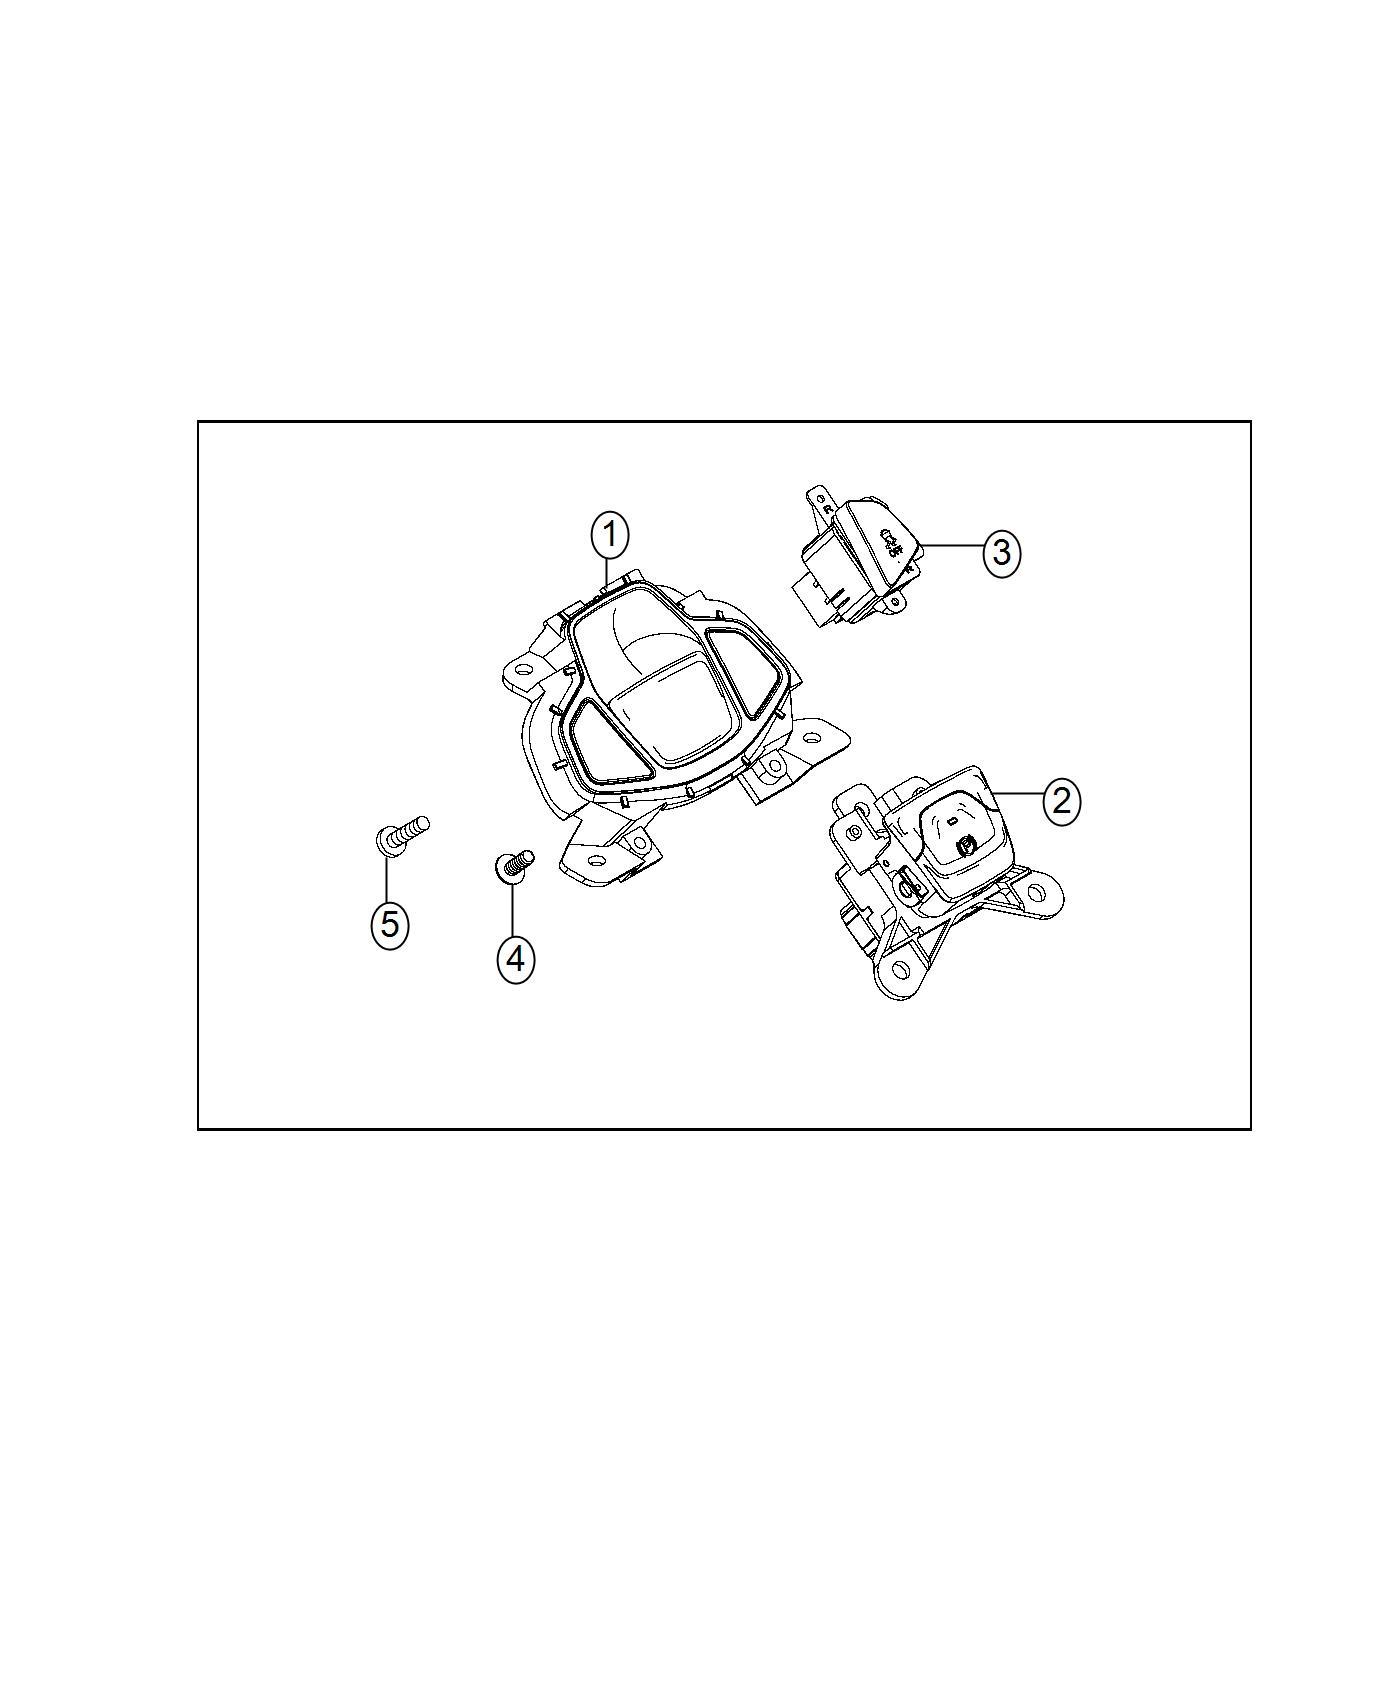 2017 jeep renegade switch  brake  electric park brake  trim   no description available